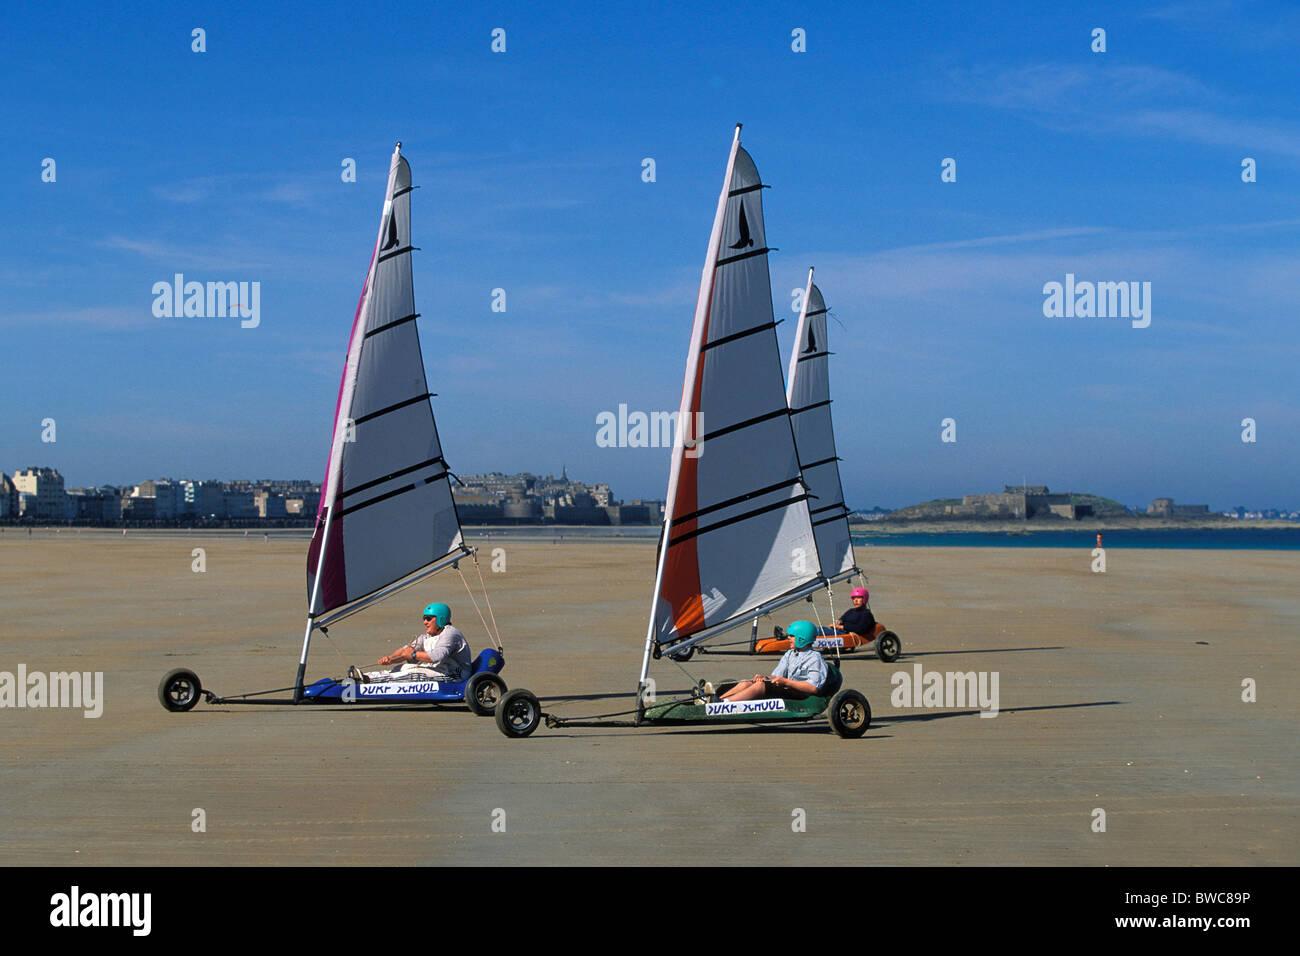 Sail Carting Land Sailing Char A Voile On Le Sillon Beach Stock Photo Alamy